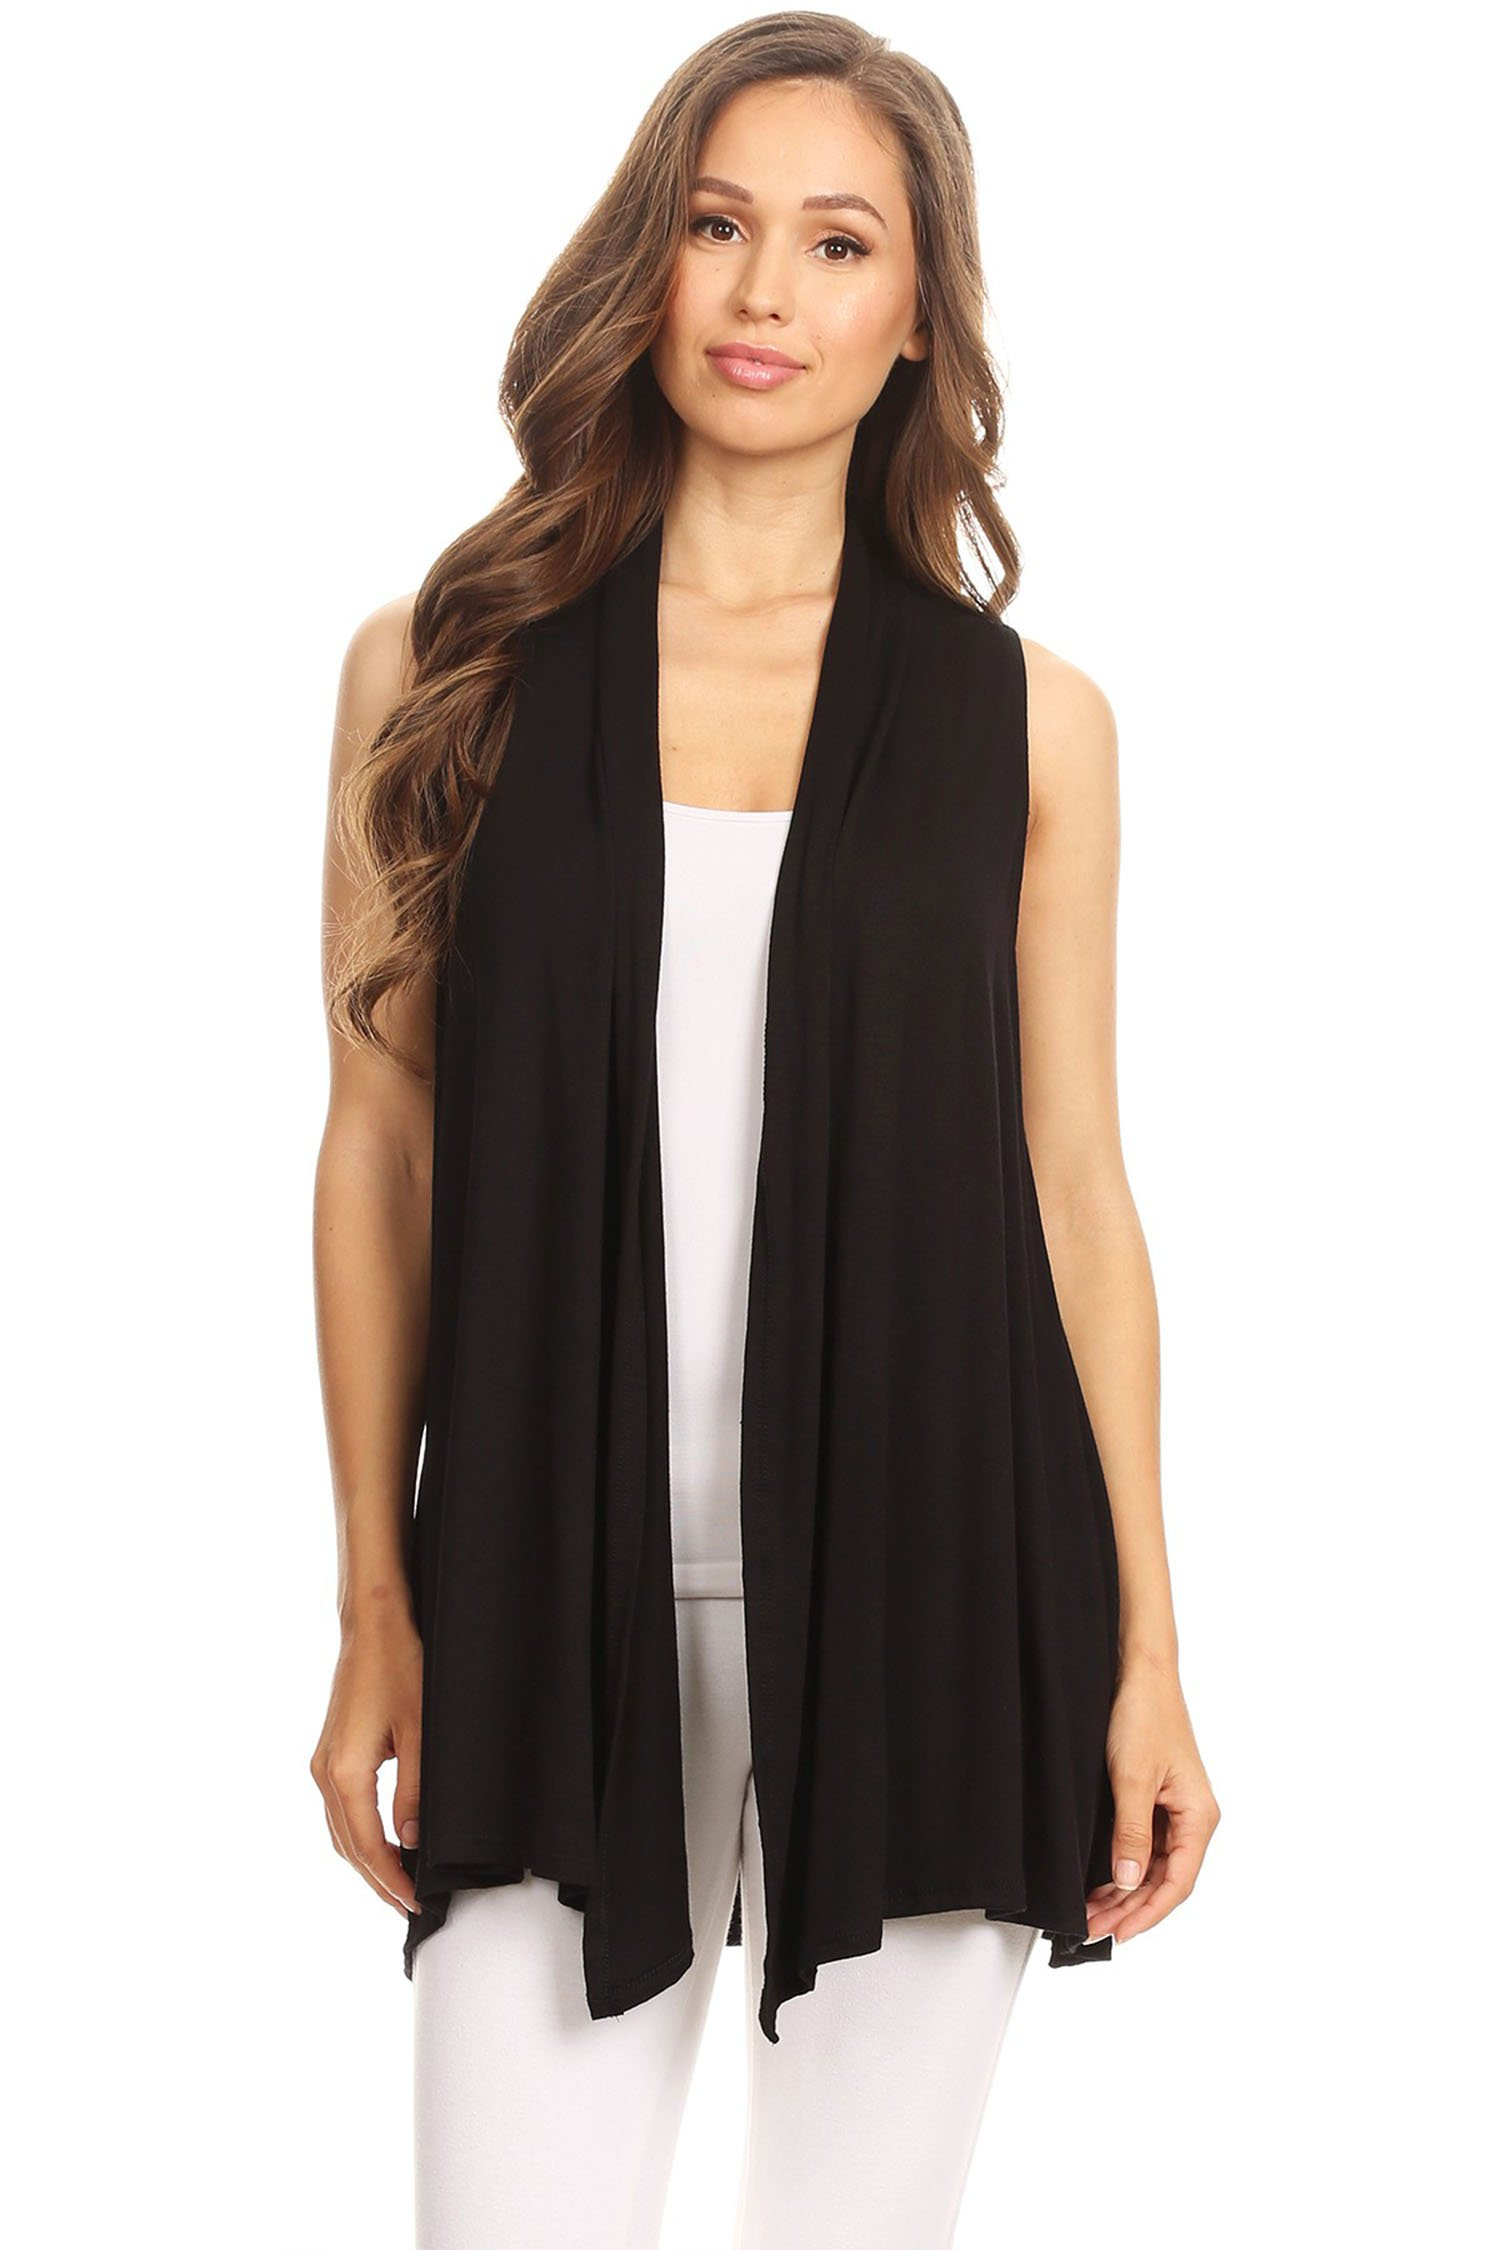 Lightweight Sleeveless Draped Open Cardigan/Made in USA Black 2XL